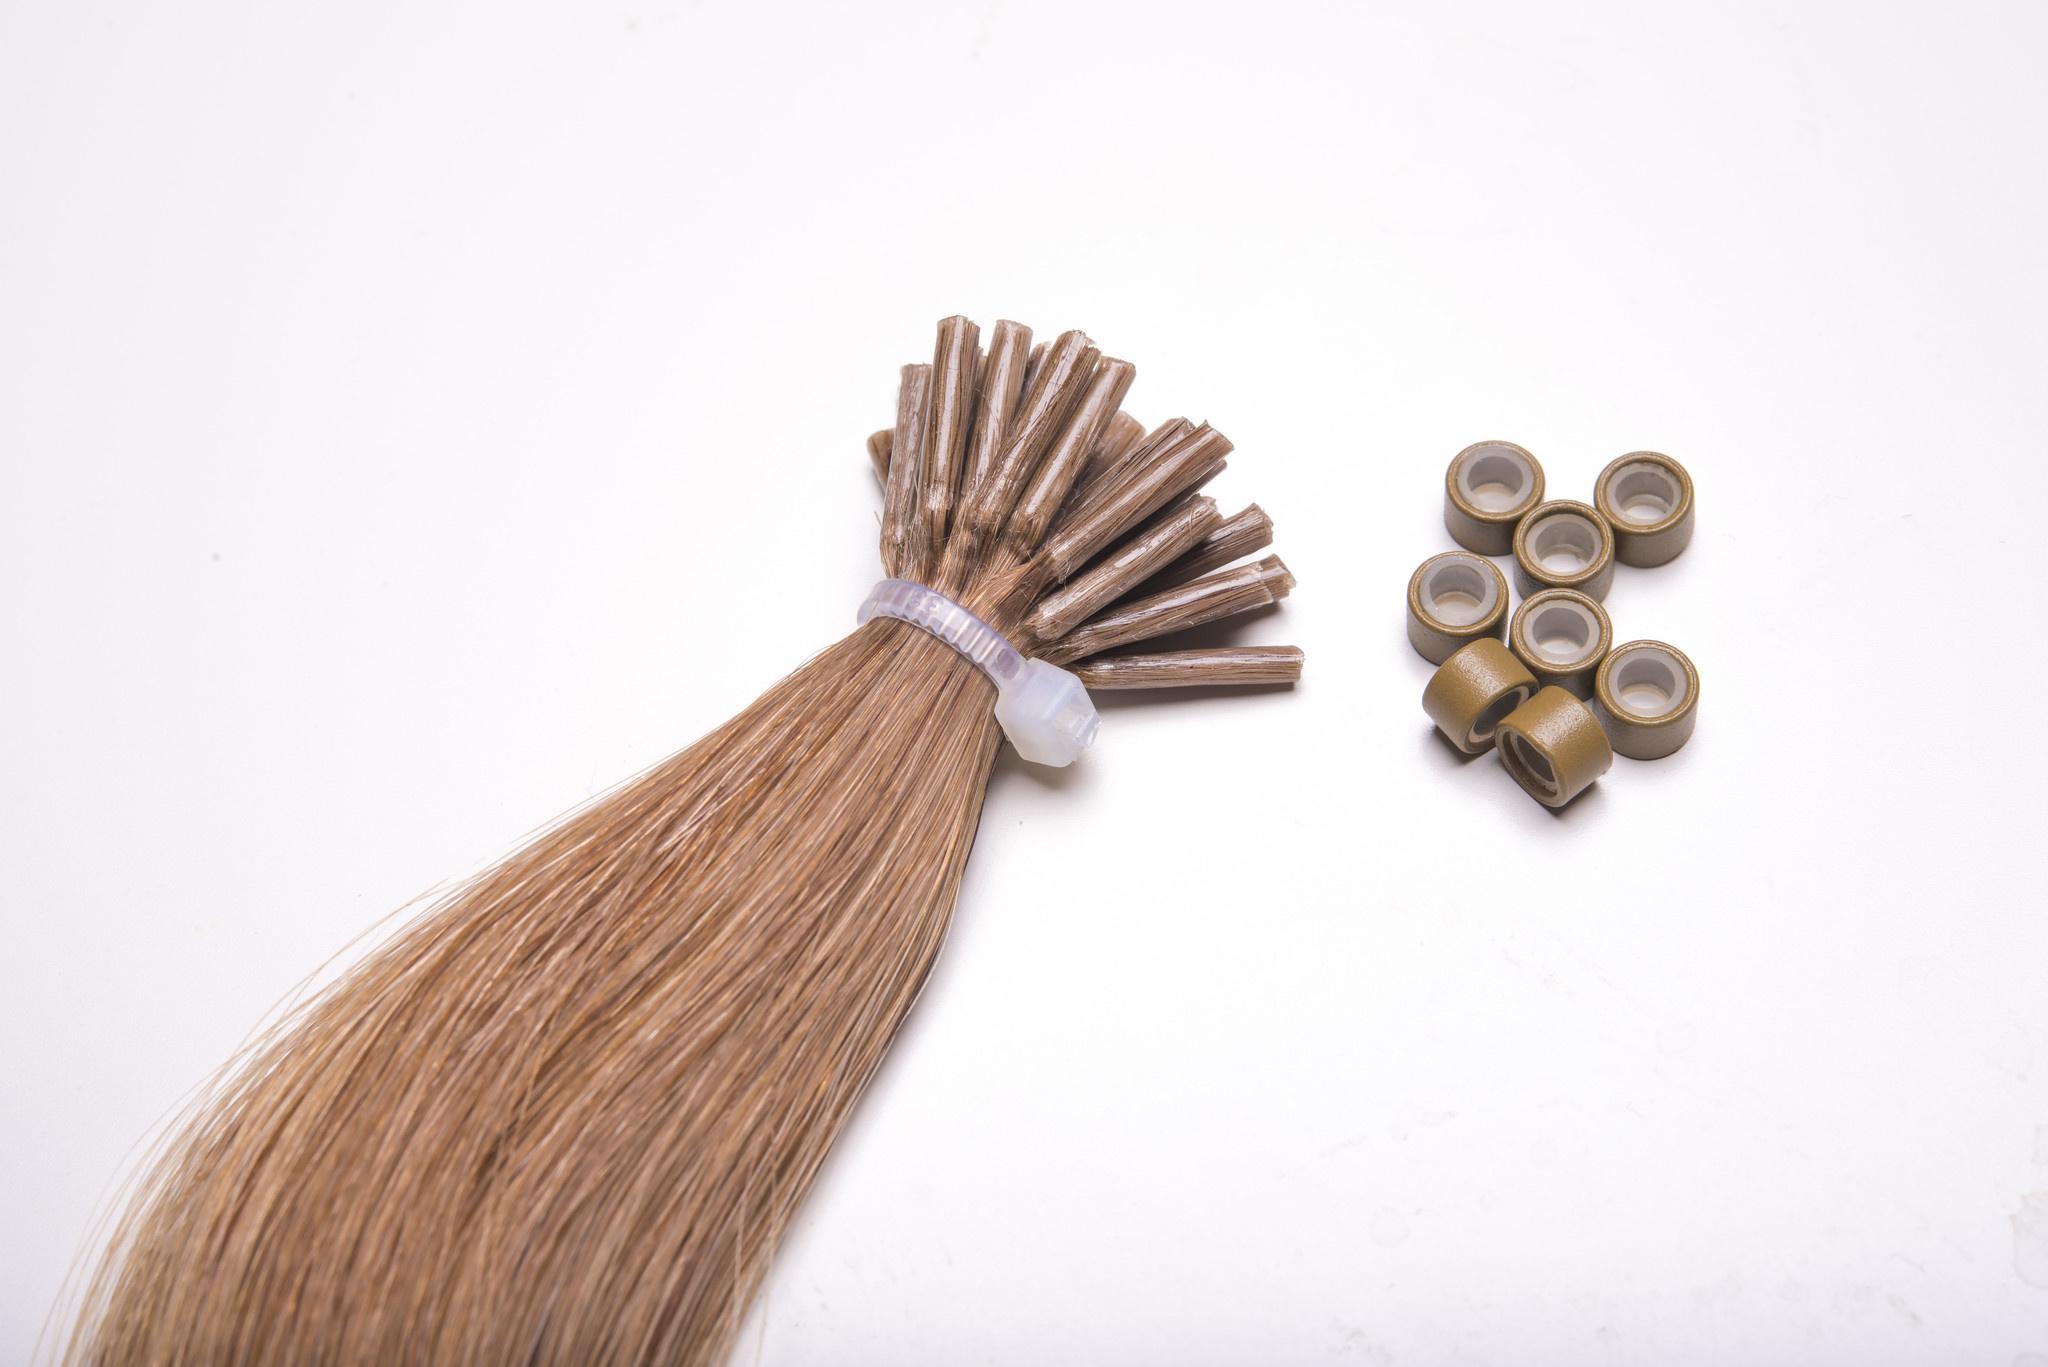 SilverFox Microring Extensions - Steil -  #8 Cinnamon